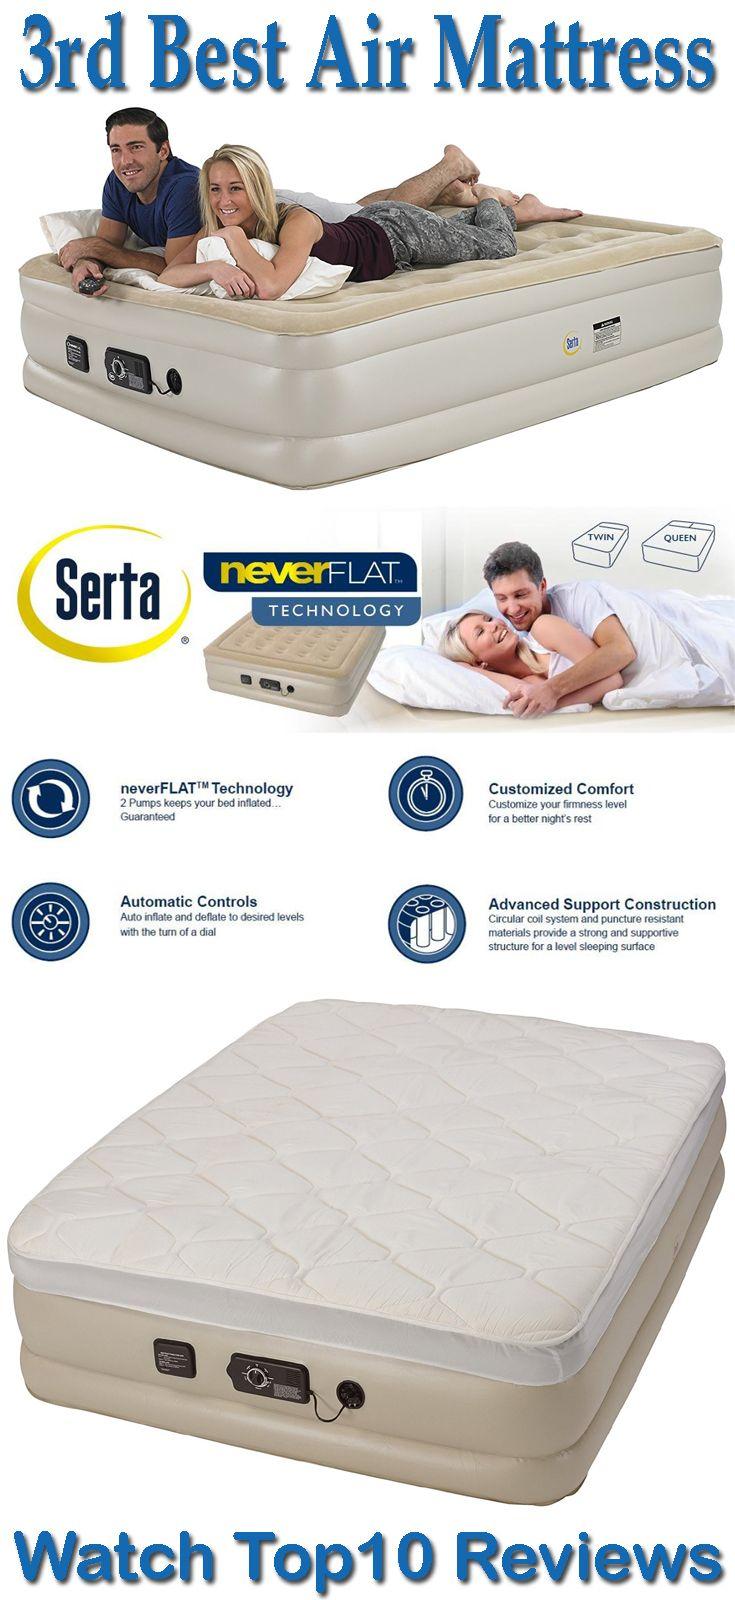 Serta Raised Air Mattress with Never Flat Pump Serta raised air